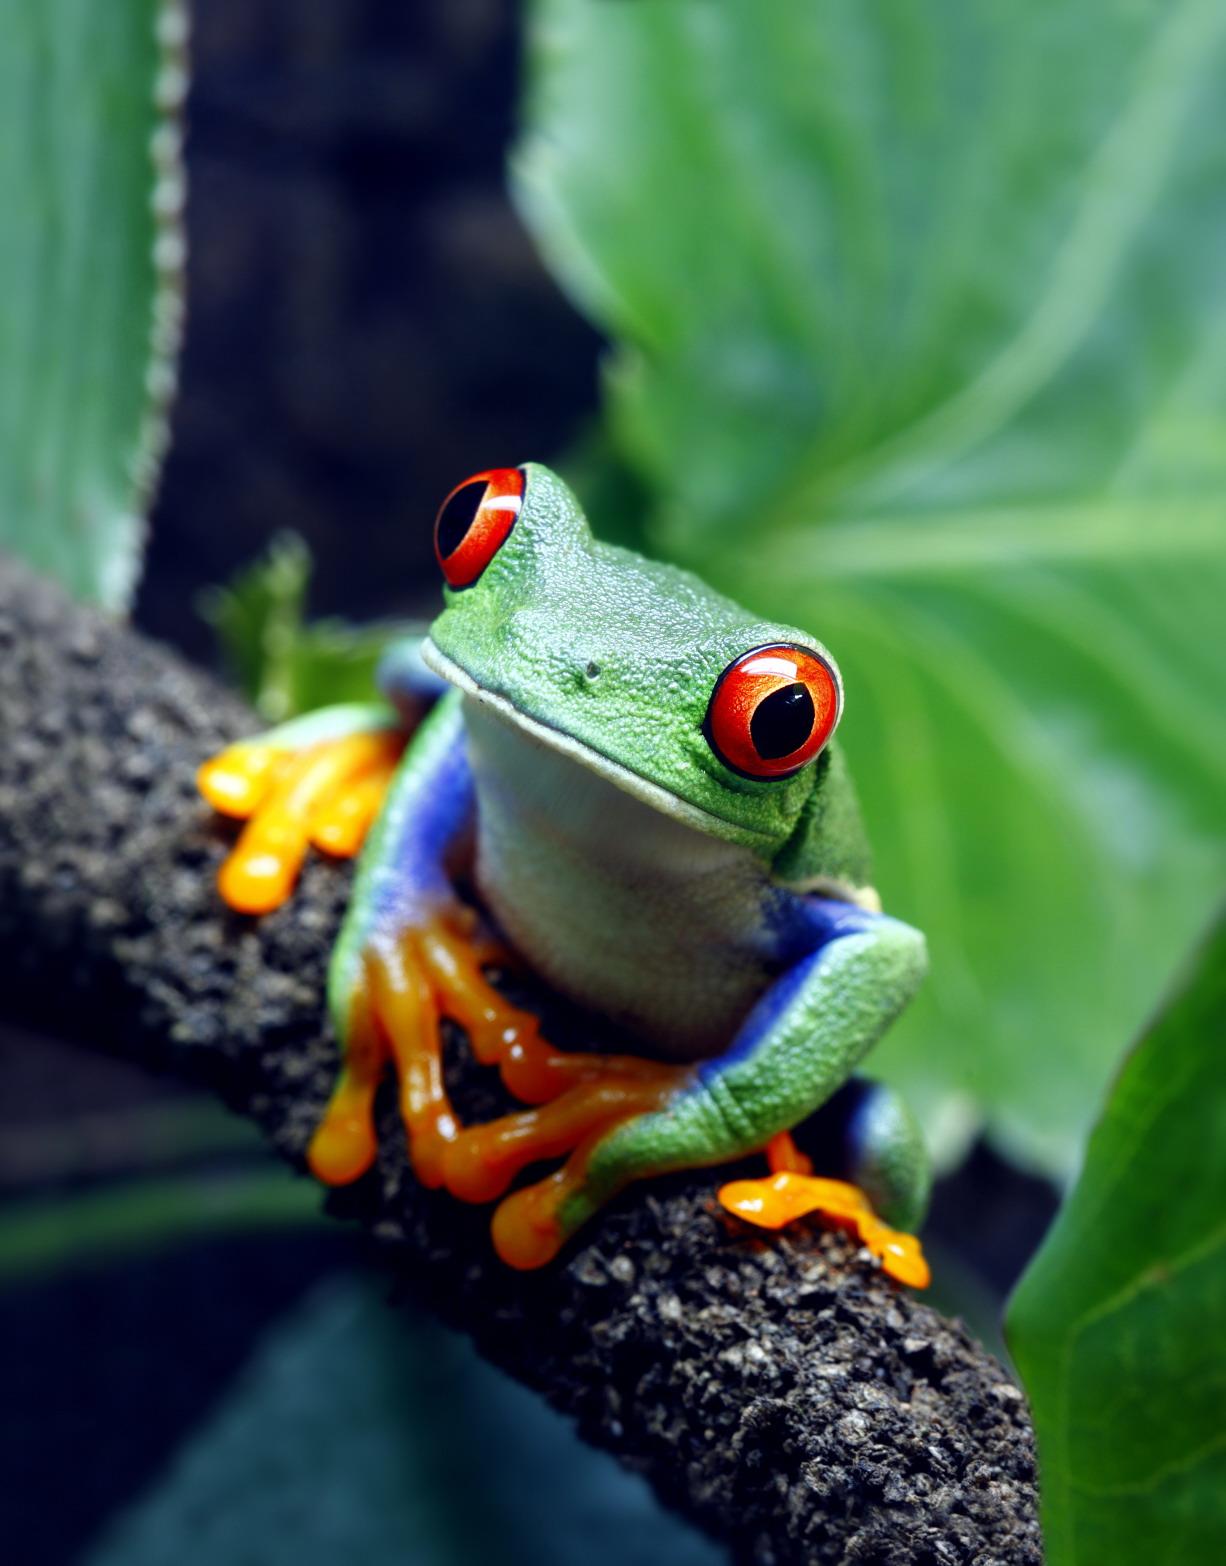 Frog eating bird - photo#22